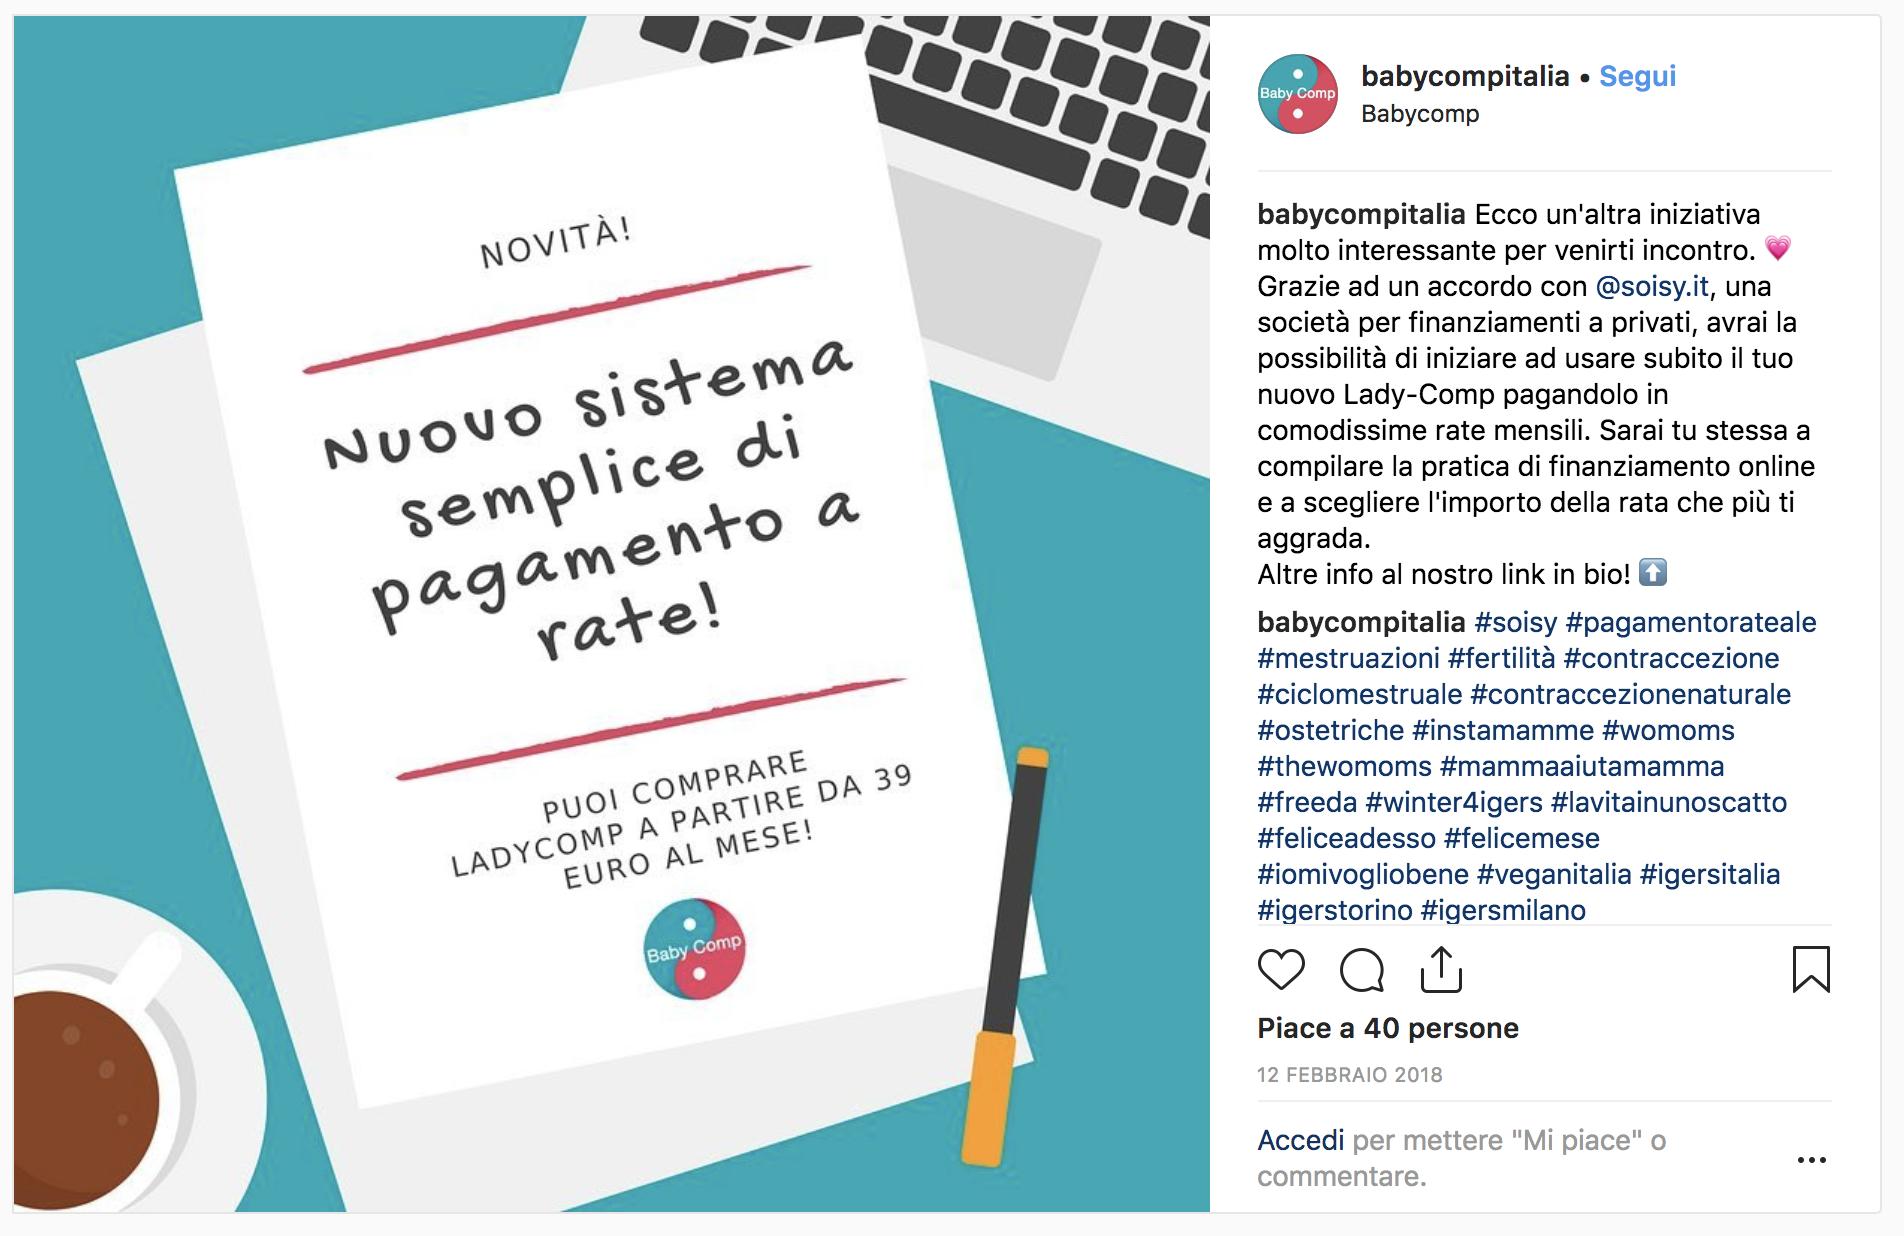 Pagamento rateale Soisy: raccontalo su Instagram